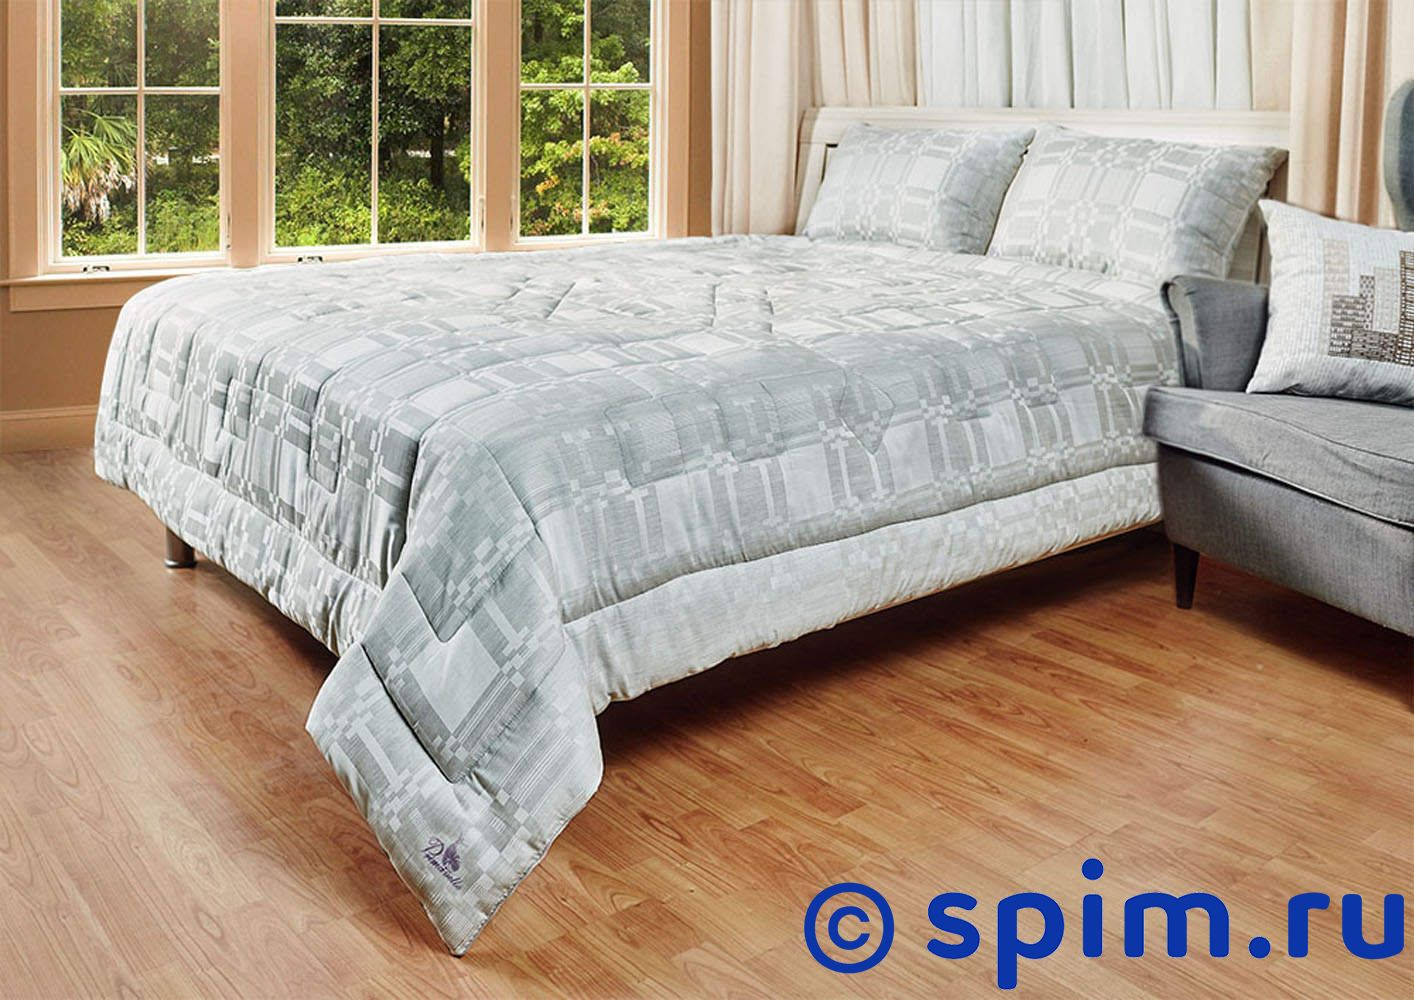 Одеяло Lino 140х205 смОдеяла и подушки Primavelle<br>Материал: 100% тенсель, наполнитель: лен (55% лен, 25% хлопок, 20% п/э). Размер, см: 140х205, 172х205, 200х220. Дополнительно: подушка (размер 50х72, 68x68). Размер Лино двуспальный: 140 x 205 см<br><br>Ширина см: 140<br>Длина см: 205